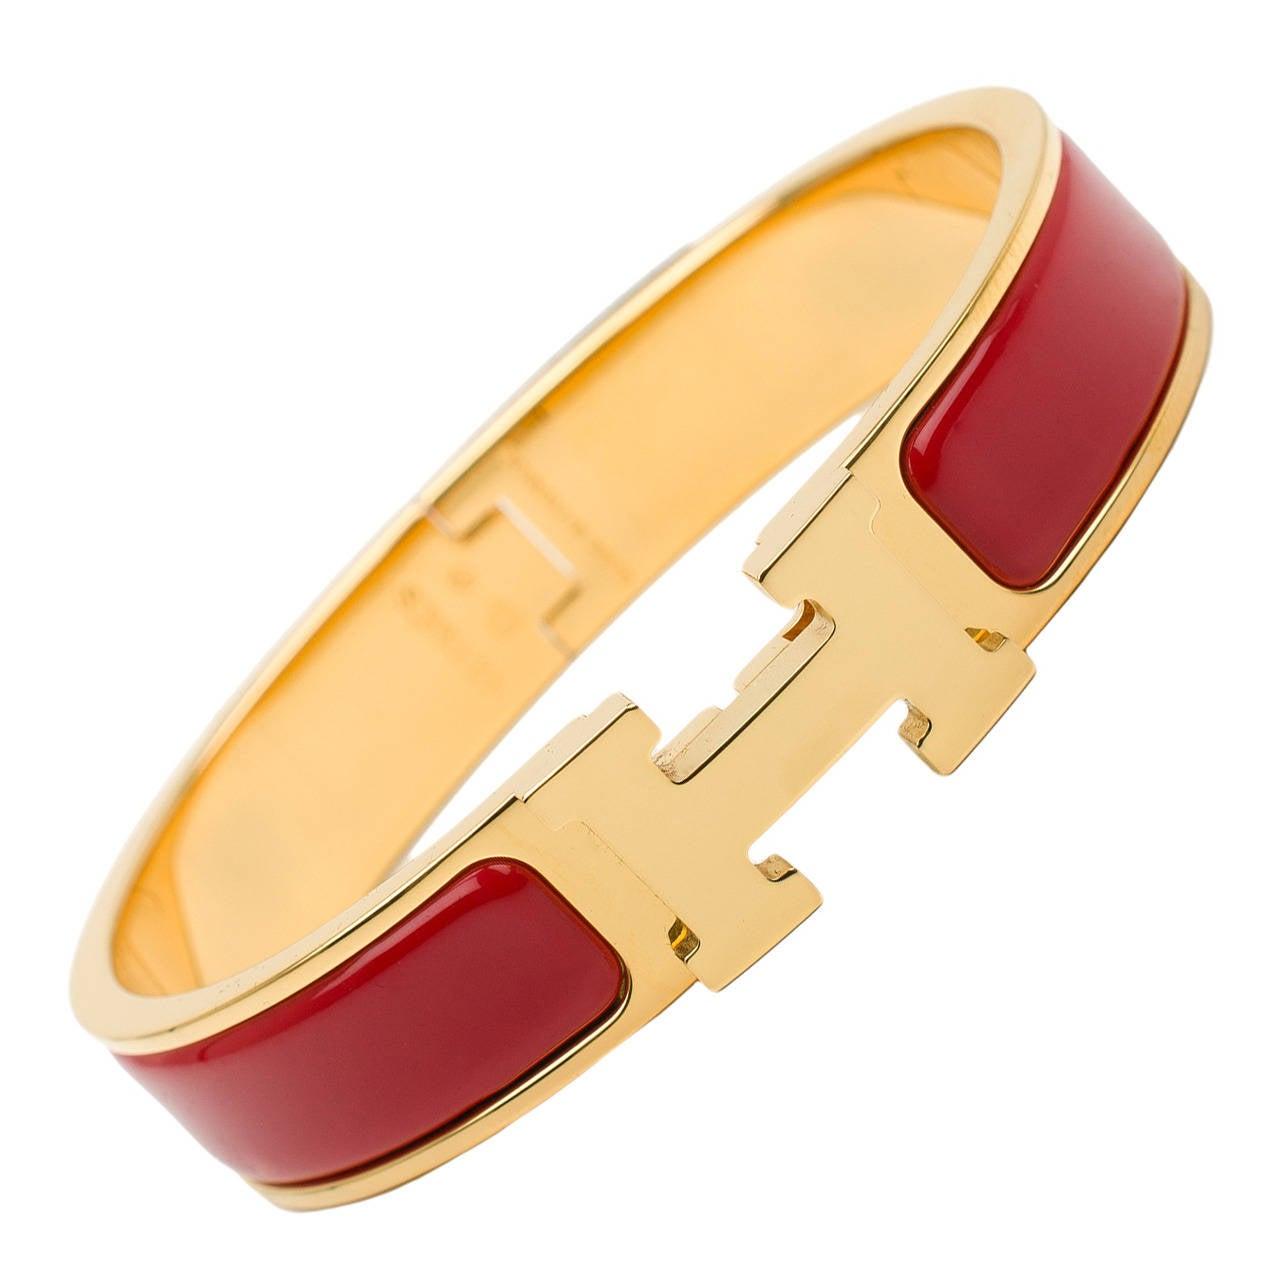 Hermes Amaranth Red Clic Clac H Narrow Enamel Bracelet Pm